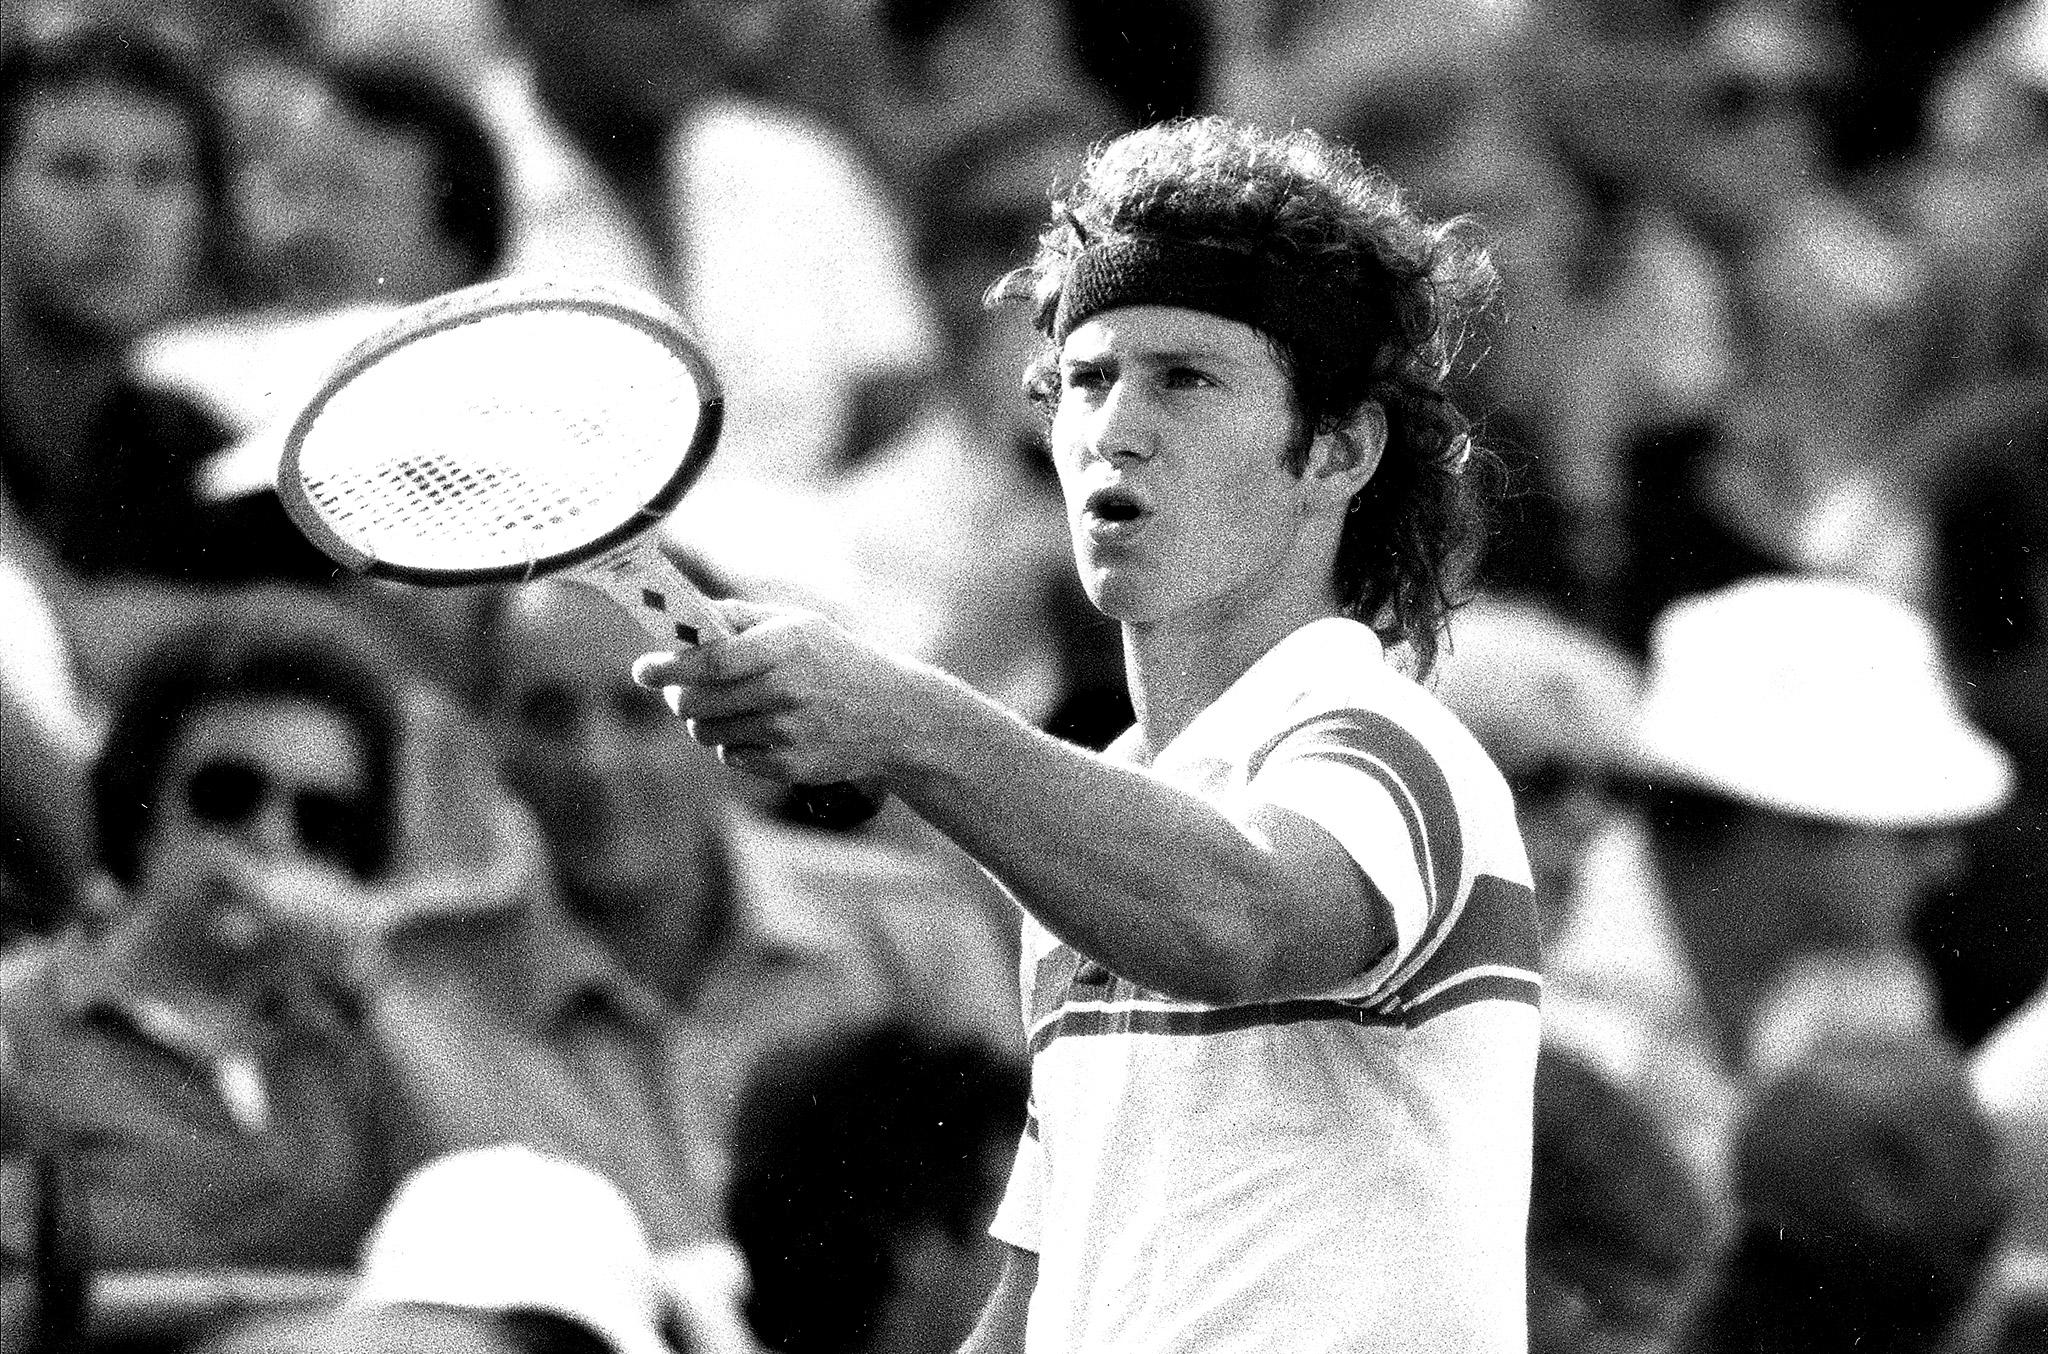 John McEnroe, Bjorn Borg